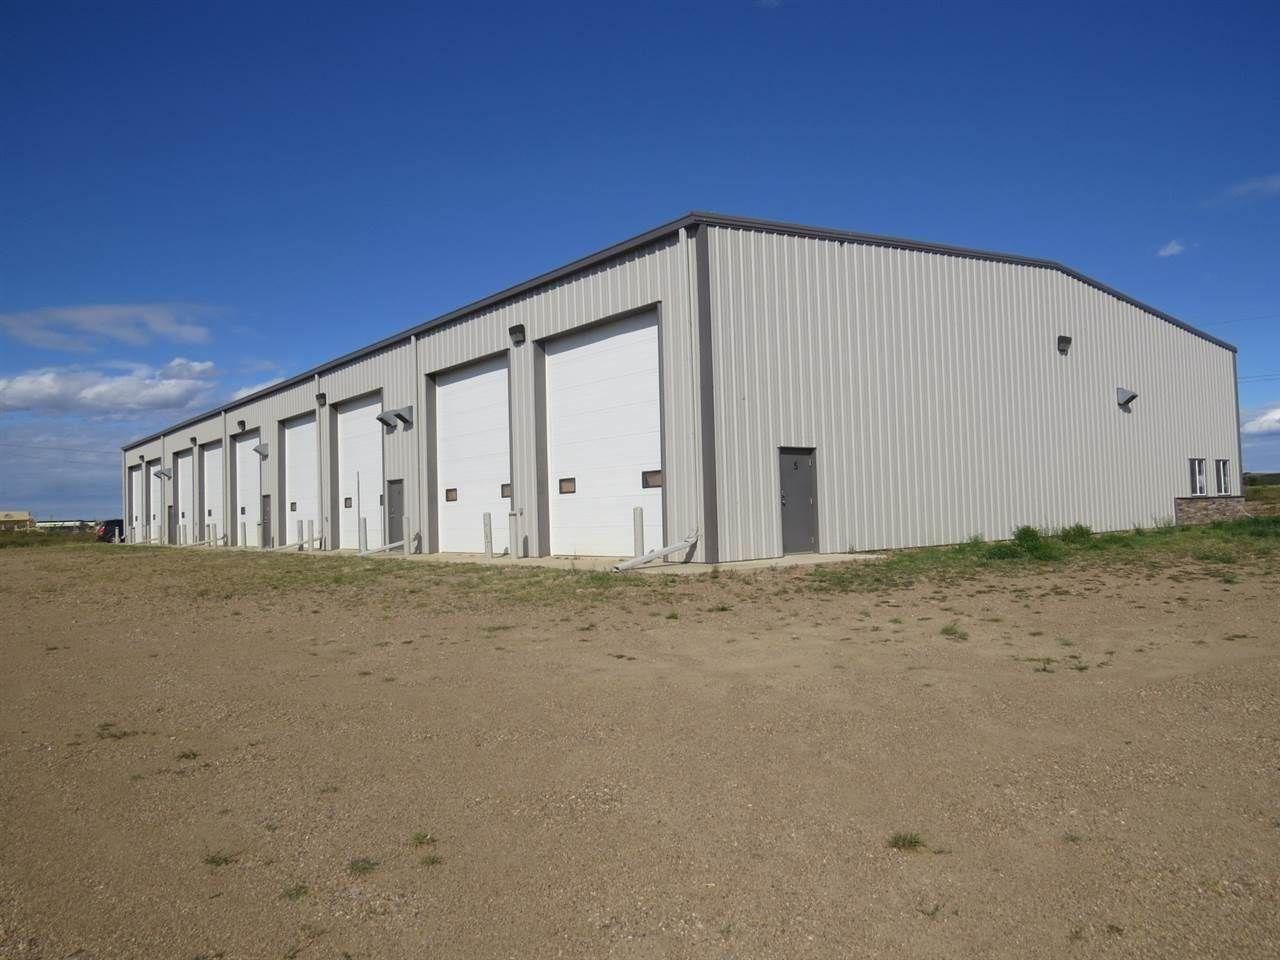 Main Photo: 4707 43 Avenue: Hardisty Industrial for sale : MLS®# E4213479